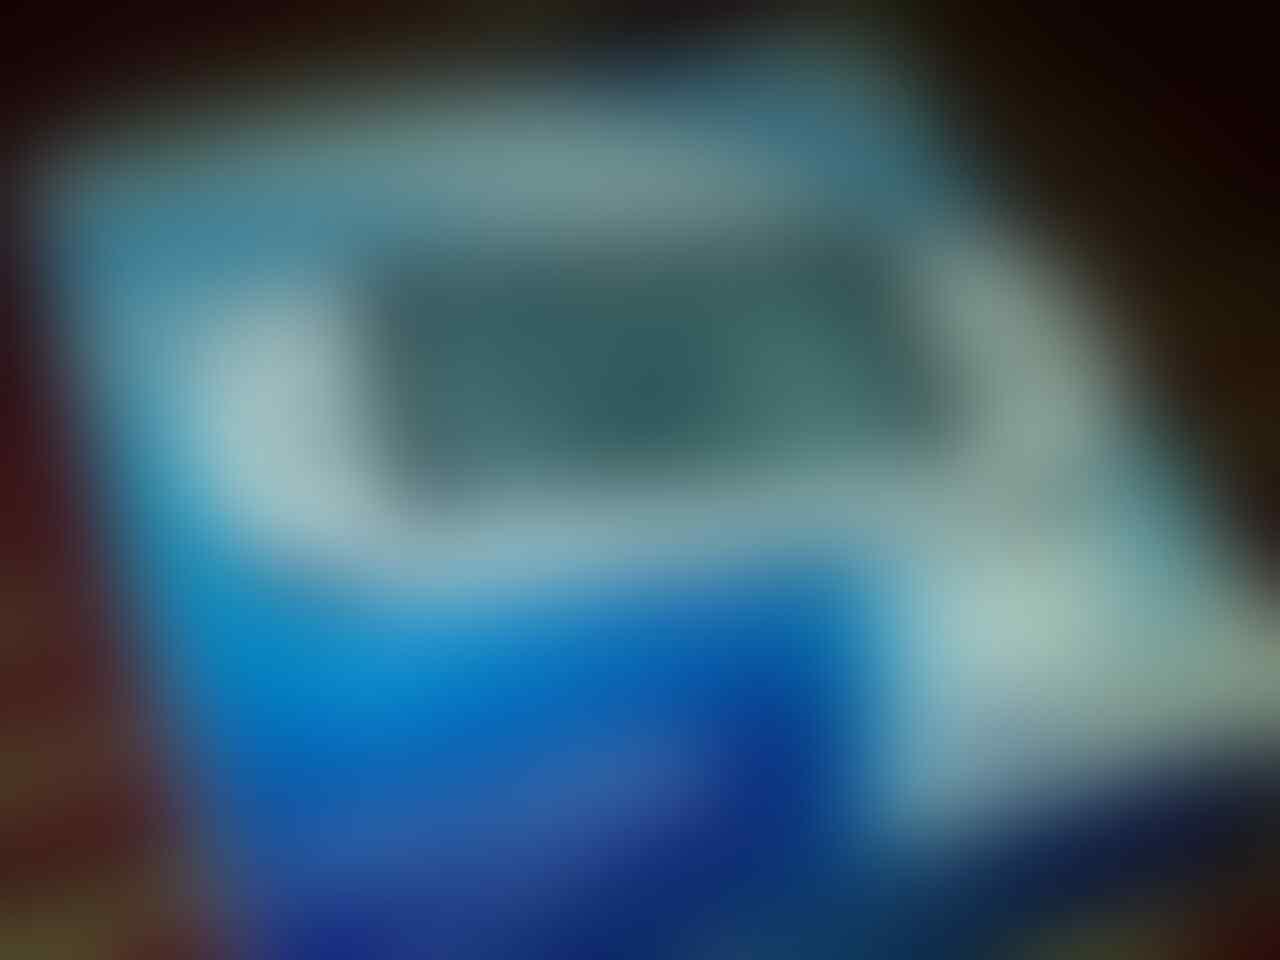 PS VITA WIFI Bandung mulus 99% plus plus